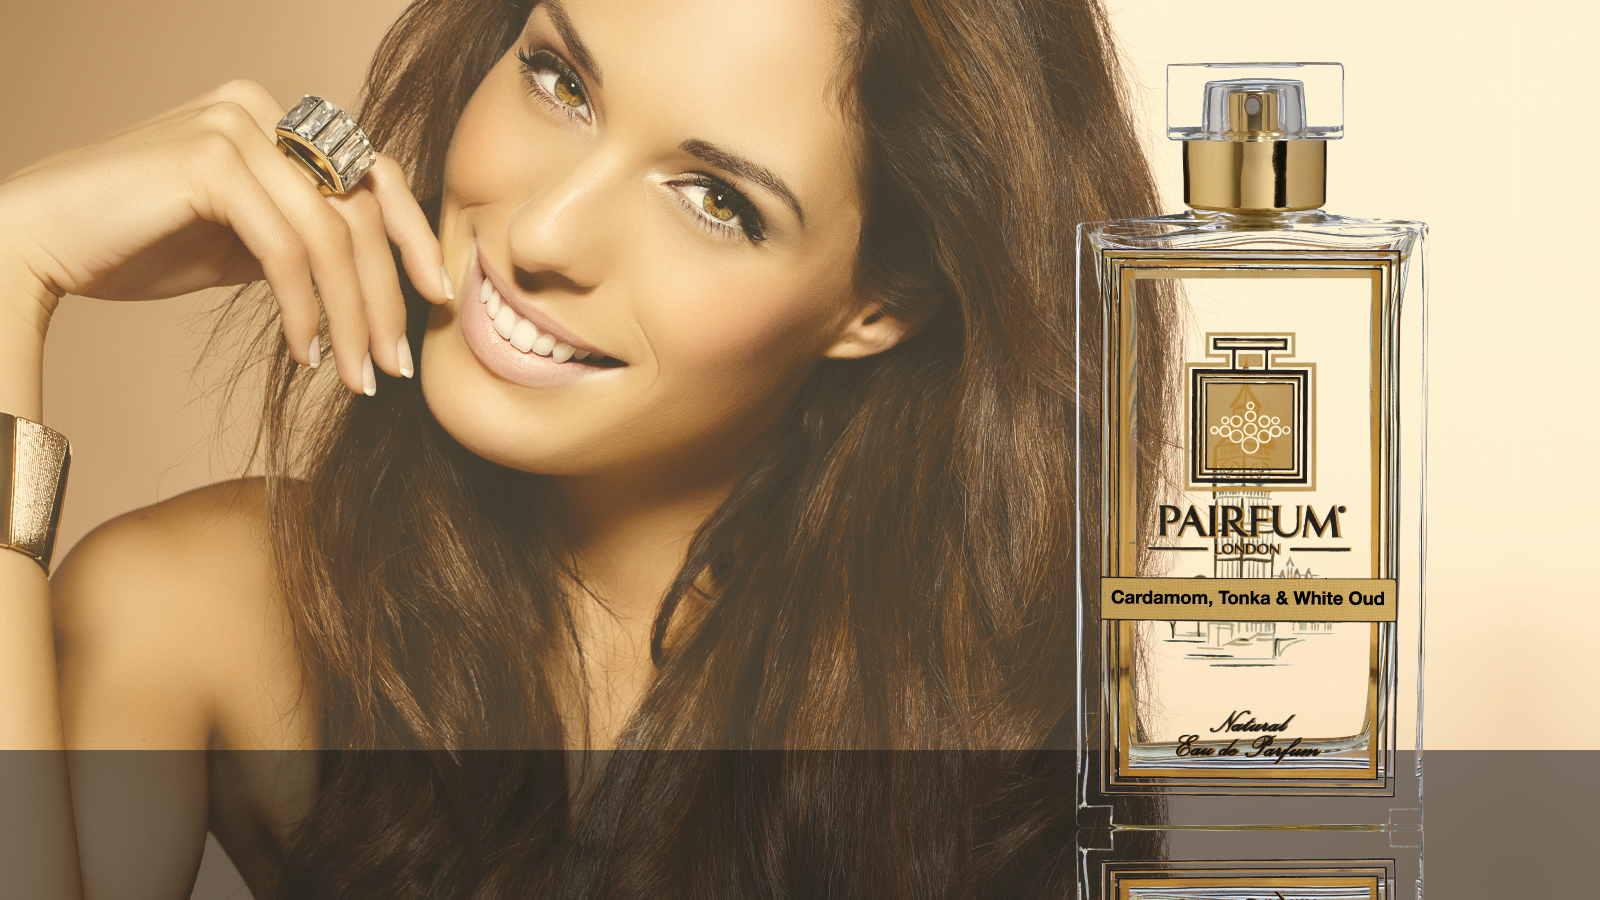 Eau De Parfum Person Reflection Cardamom Tonka White Oud Woman 16 9